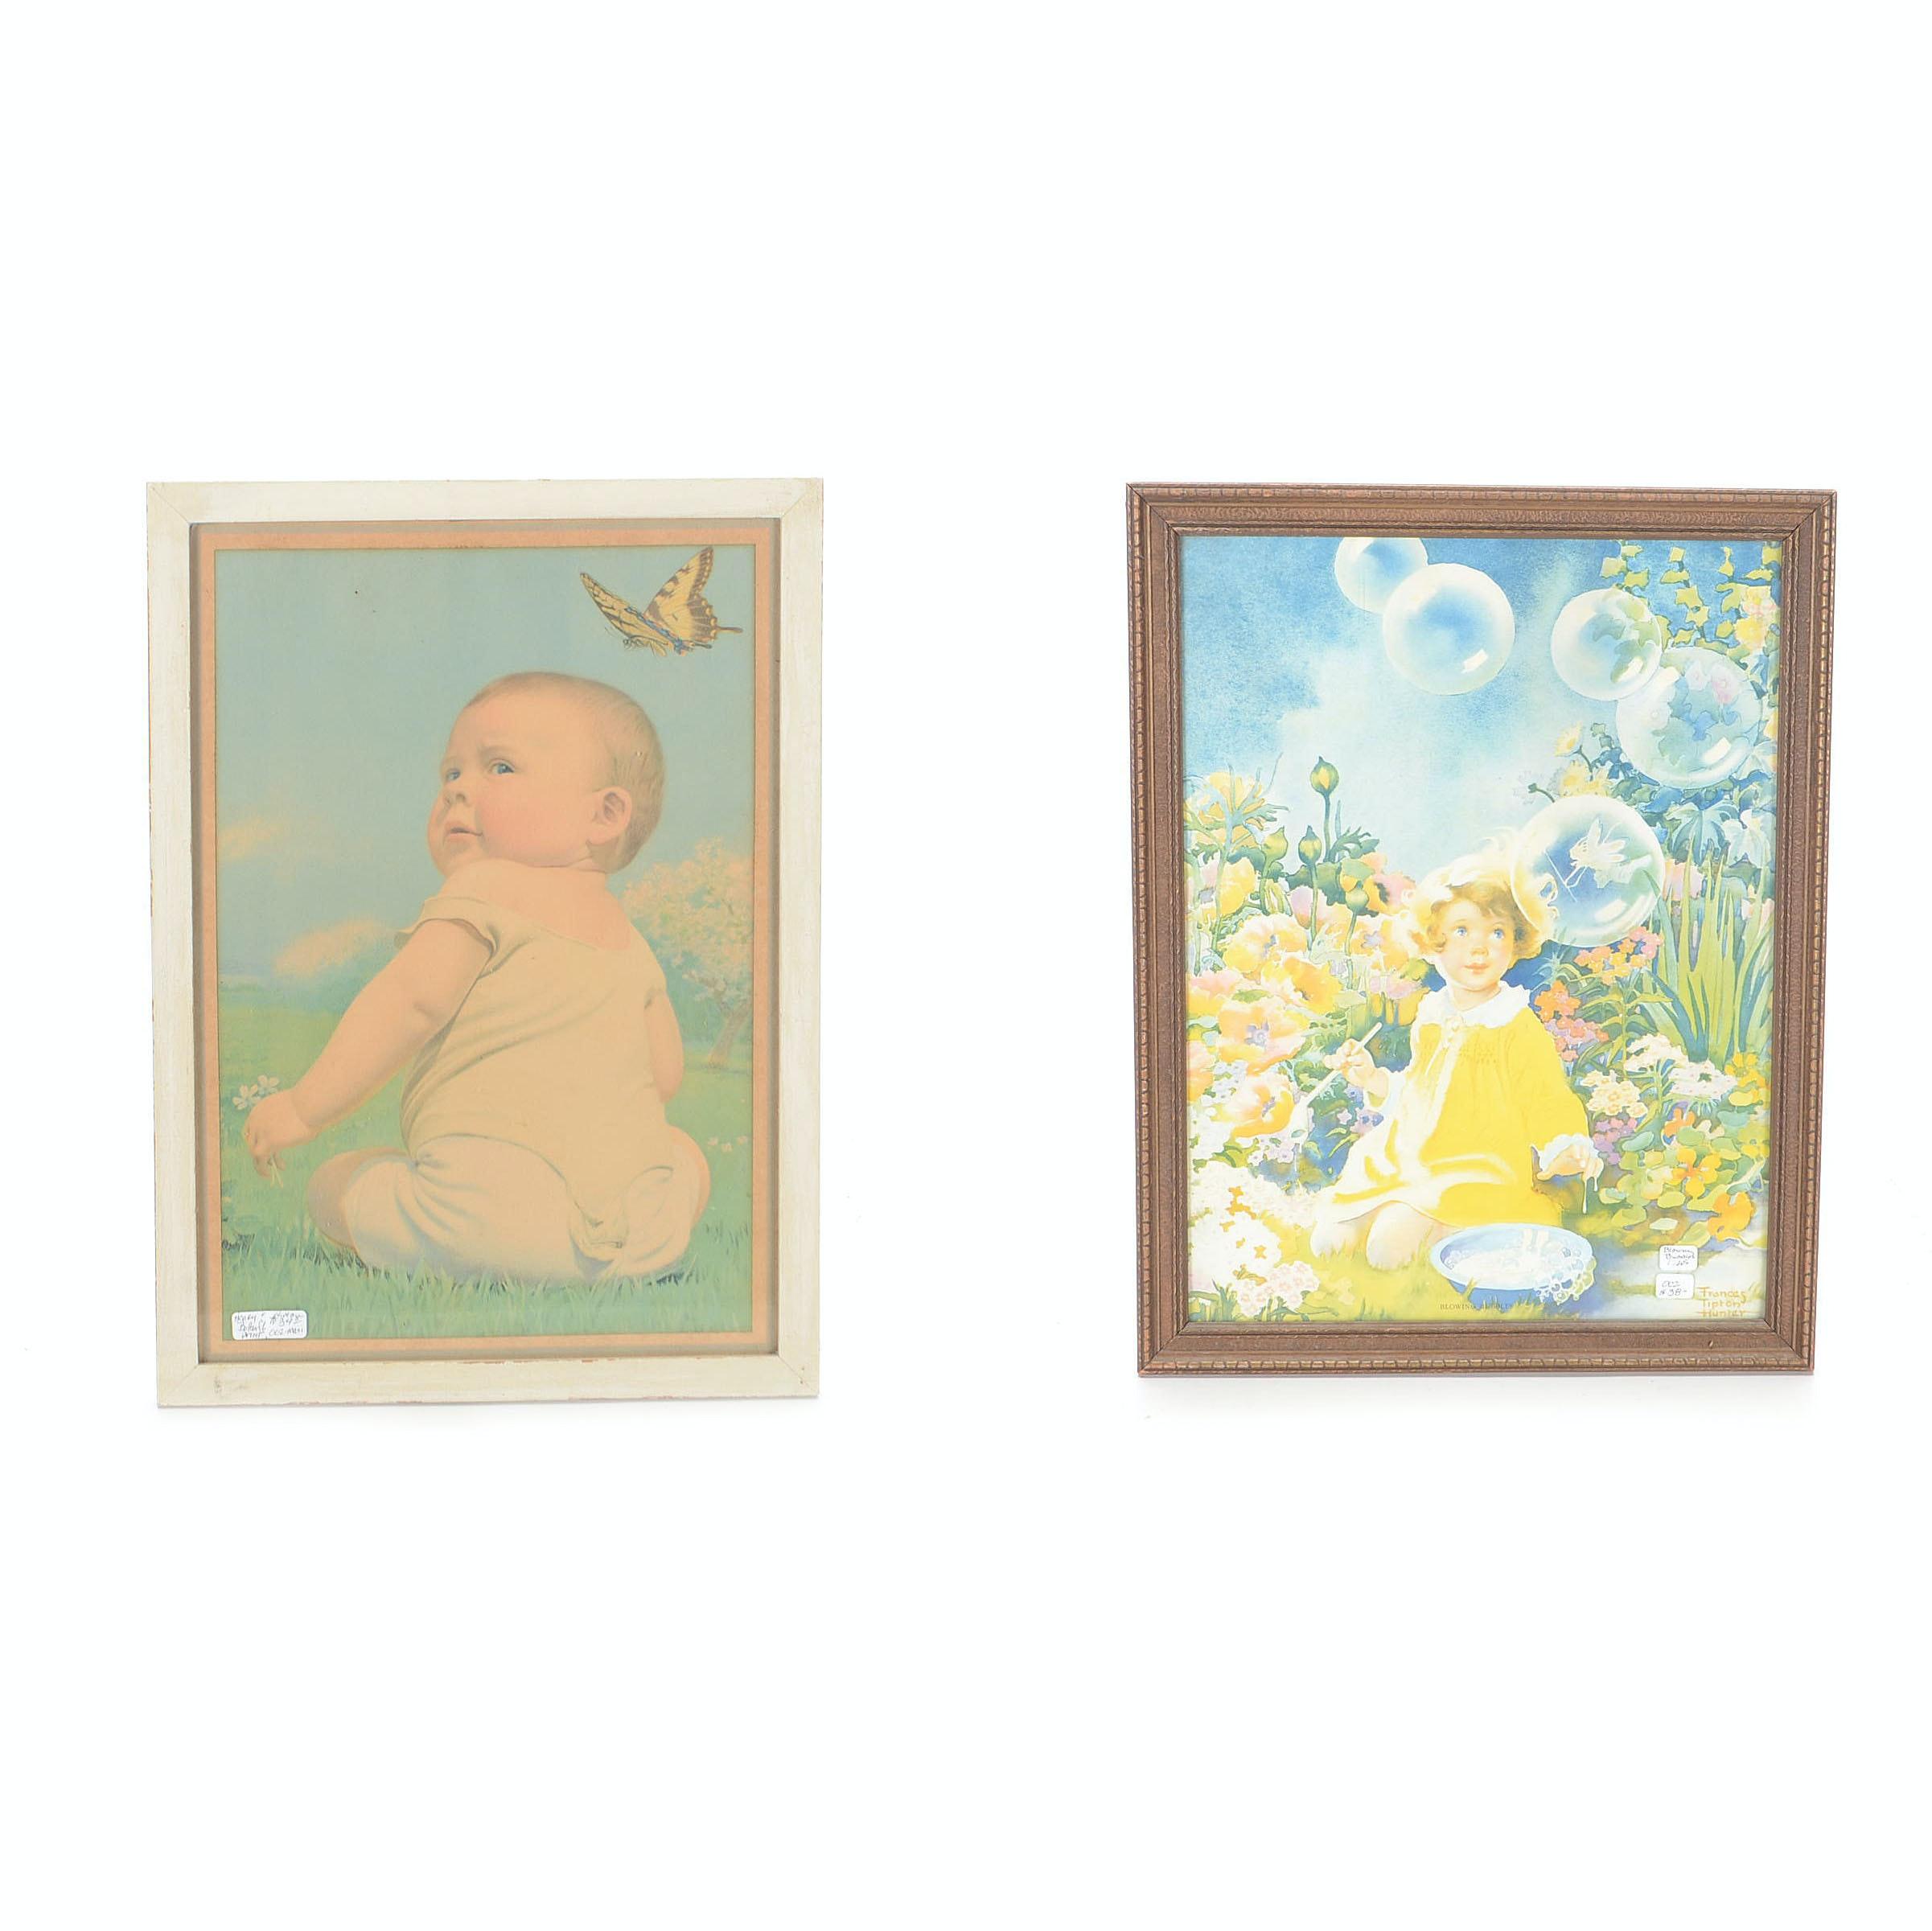 Pair of Vintage Prints of Children